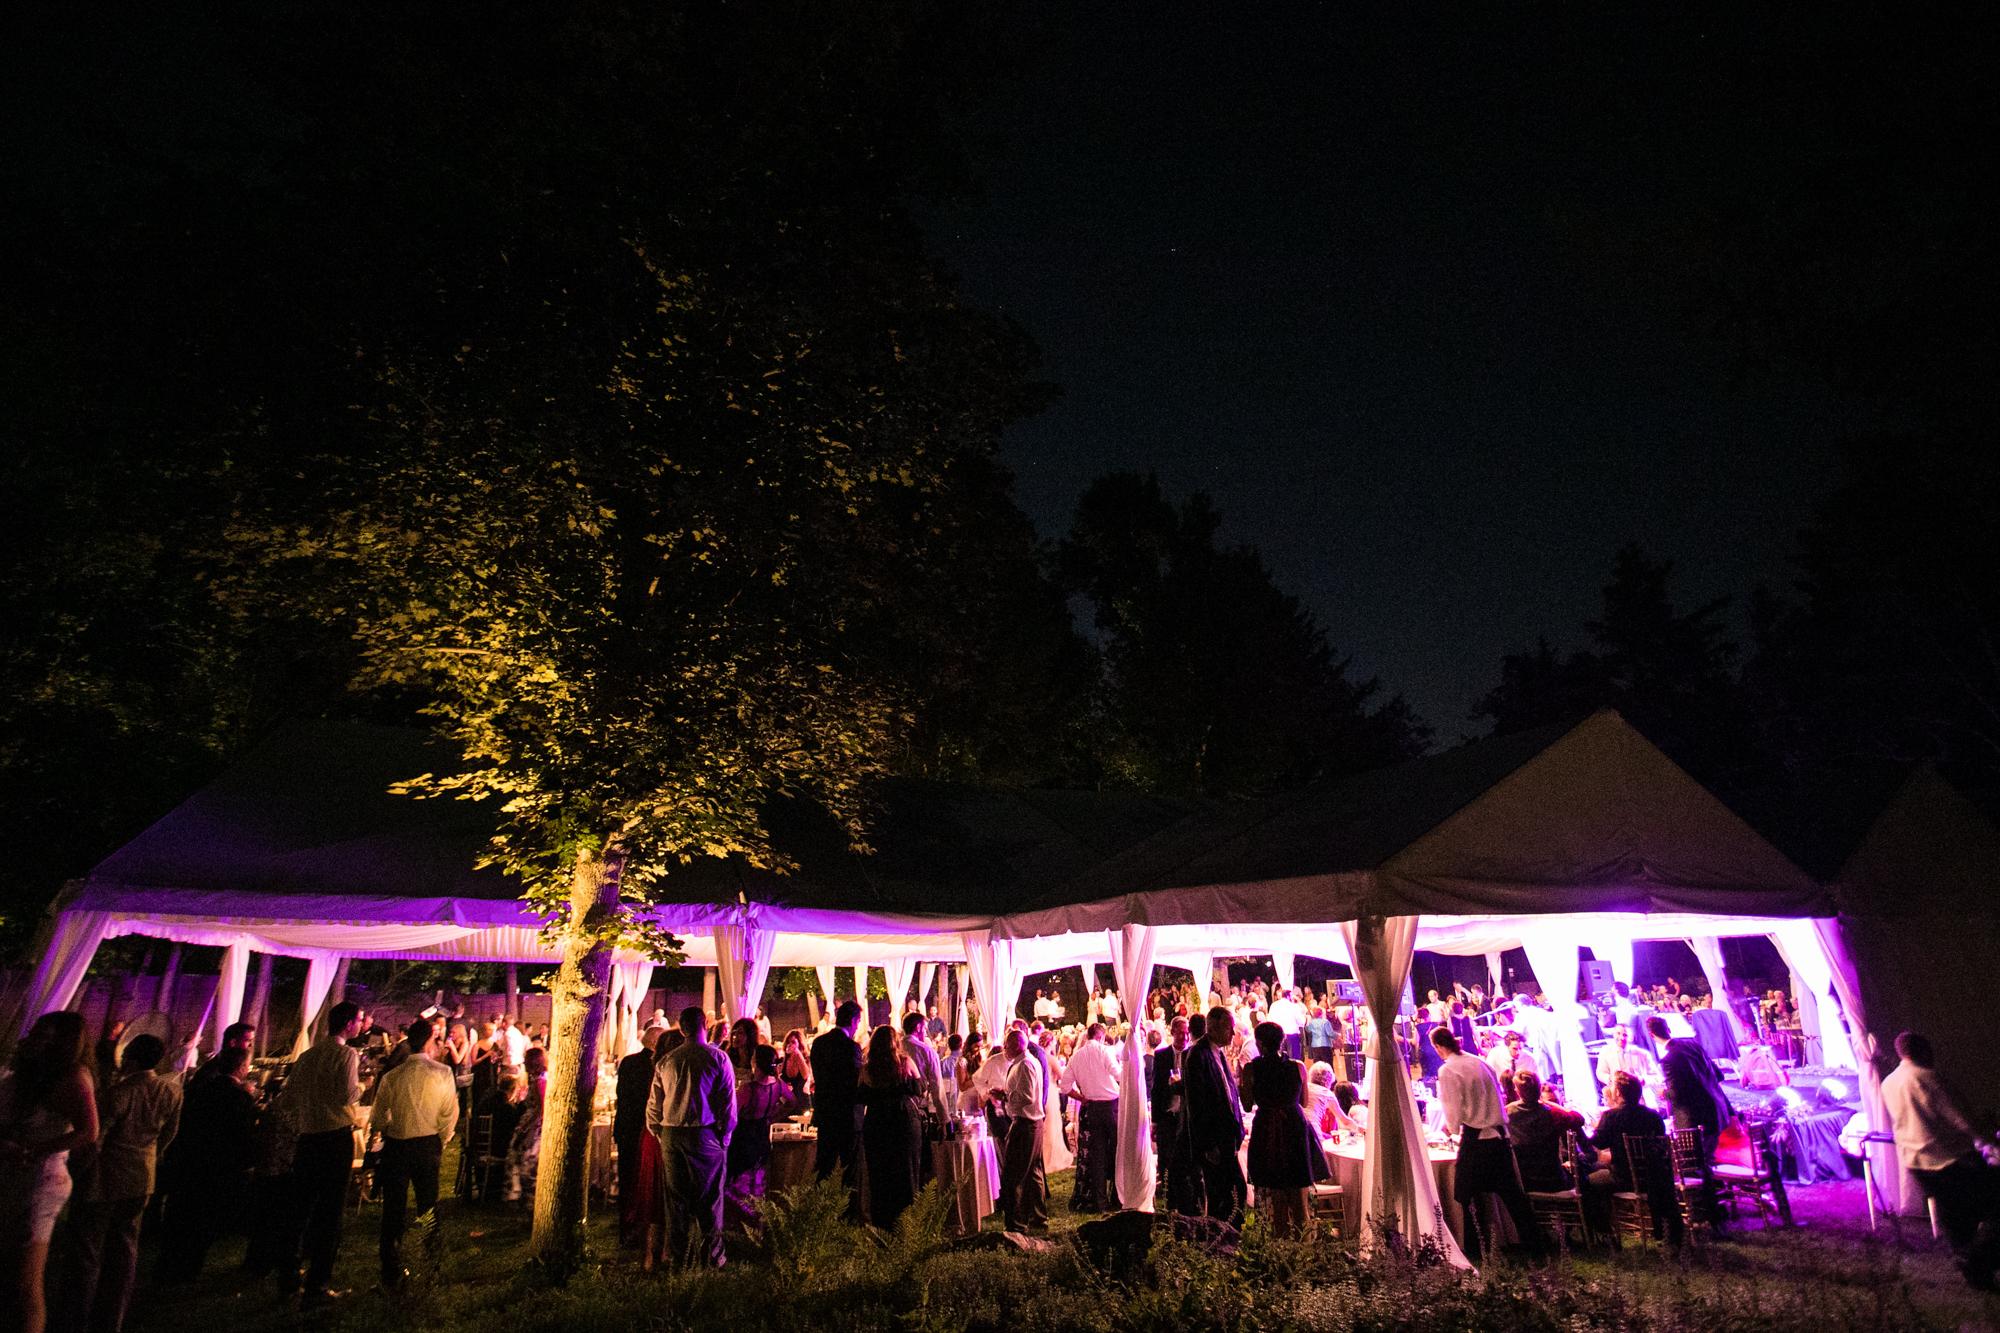 greek-wedding-salt-lake-city-utah-51.jpg